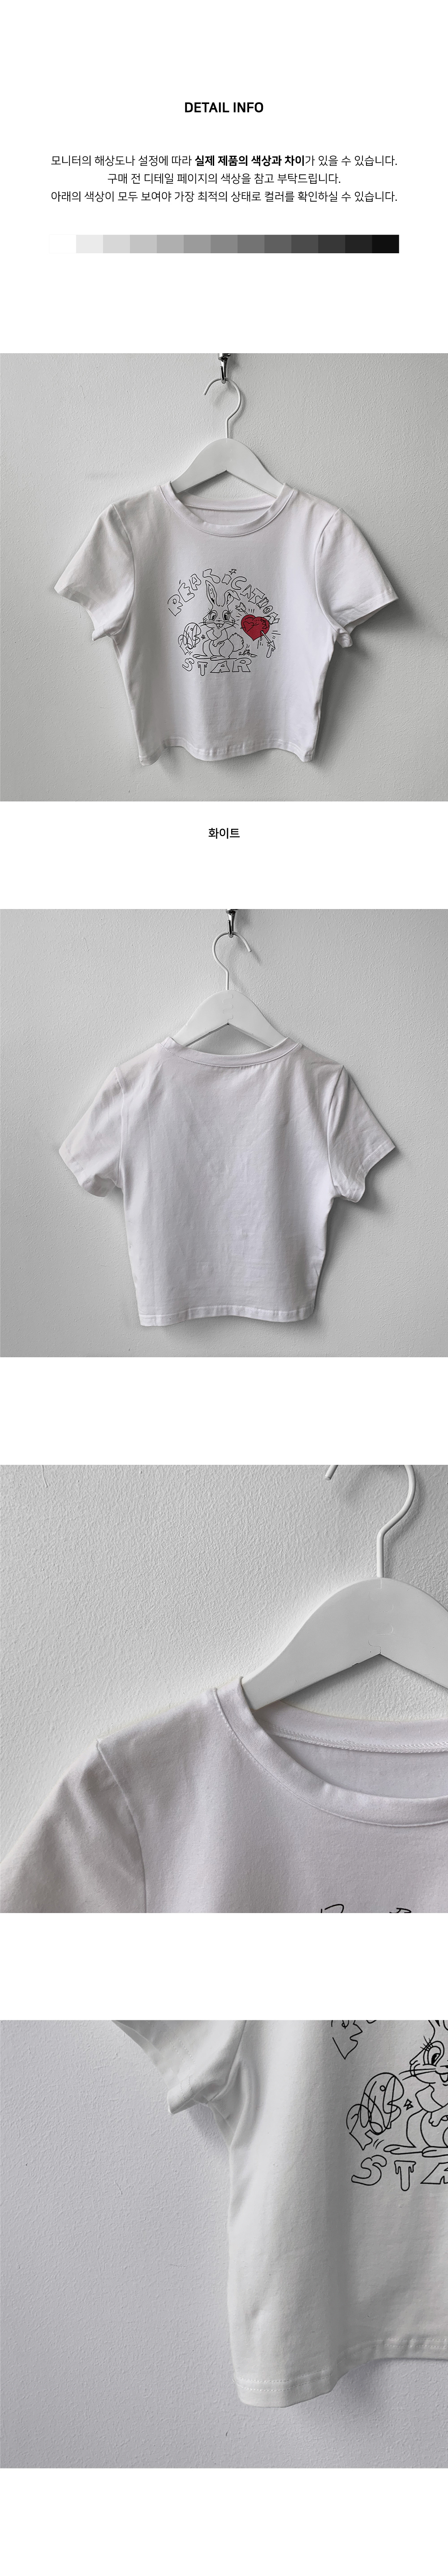 Pompom Kitsch Bunny Crop Short Sleeve T-shirt